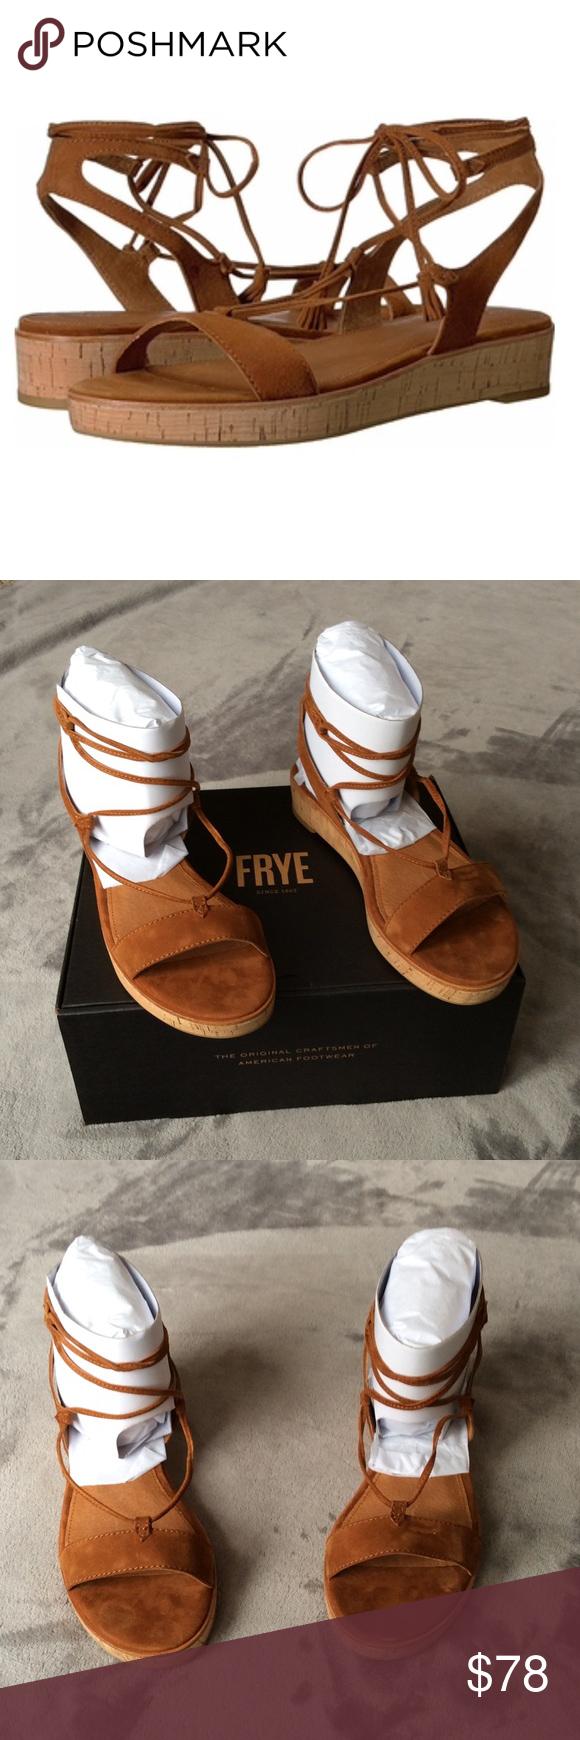 714e758b2a8 NIB Frye Miranda Gladiator Sandals The Frye Miranda Gladiator Sandal offers  the perfect relaxed chic style